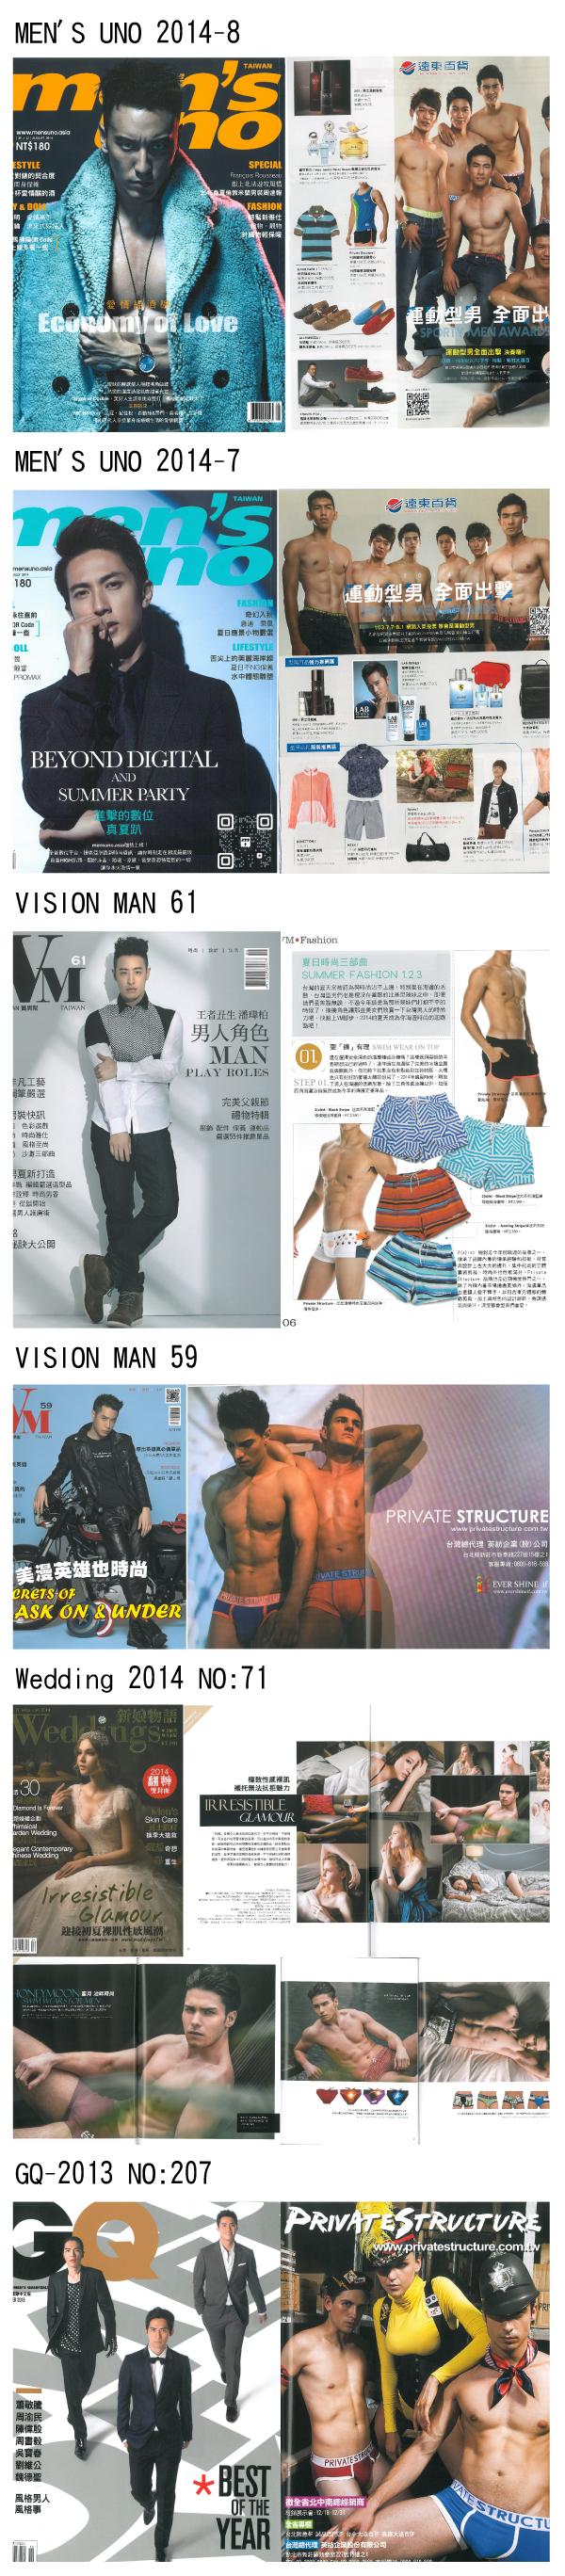 http://www.momoshop.com.tw/expertimg/0003/737/822/ps-magazine.jpg?t=1448902187